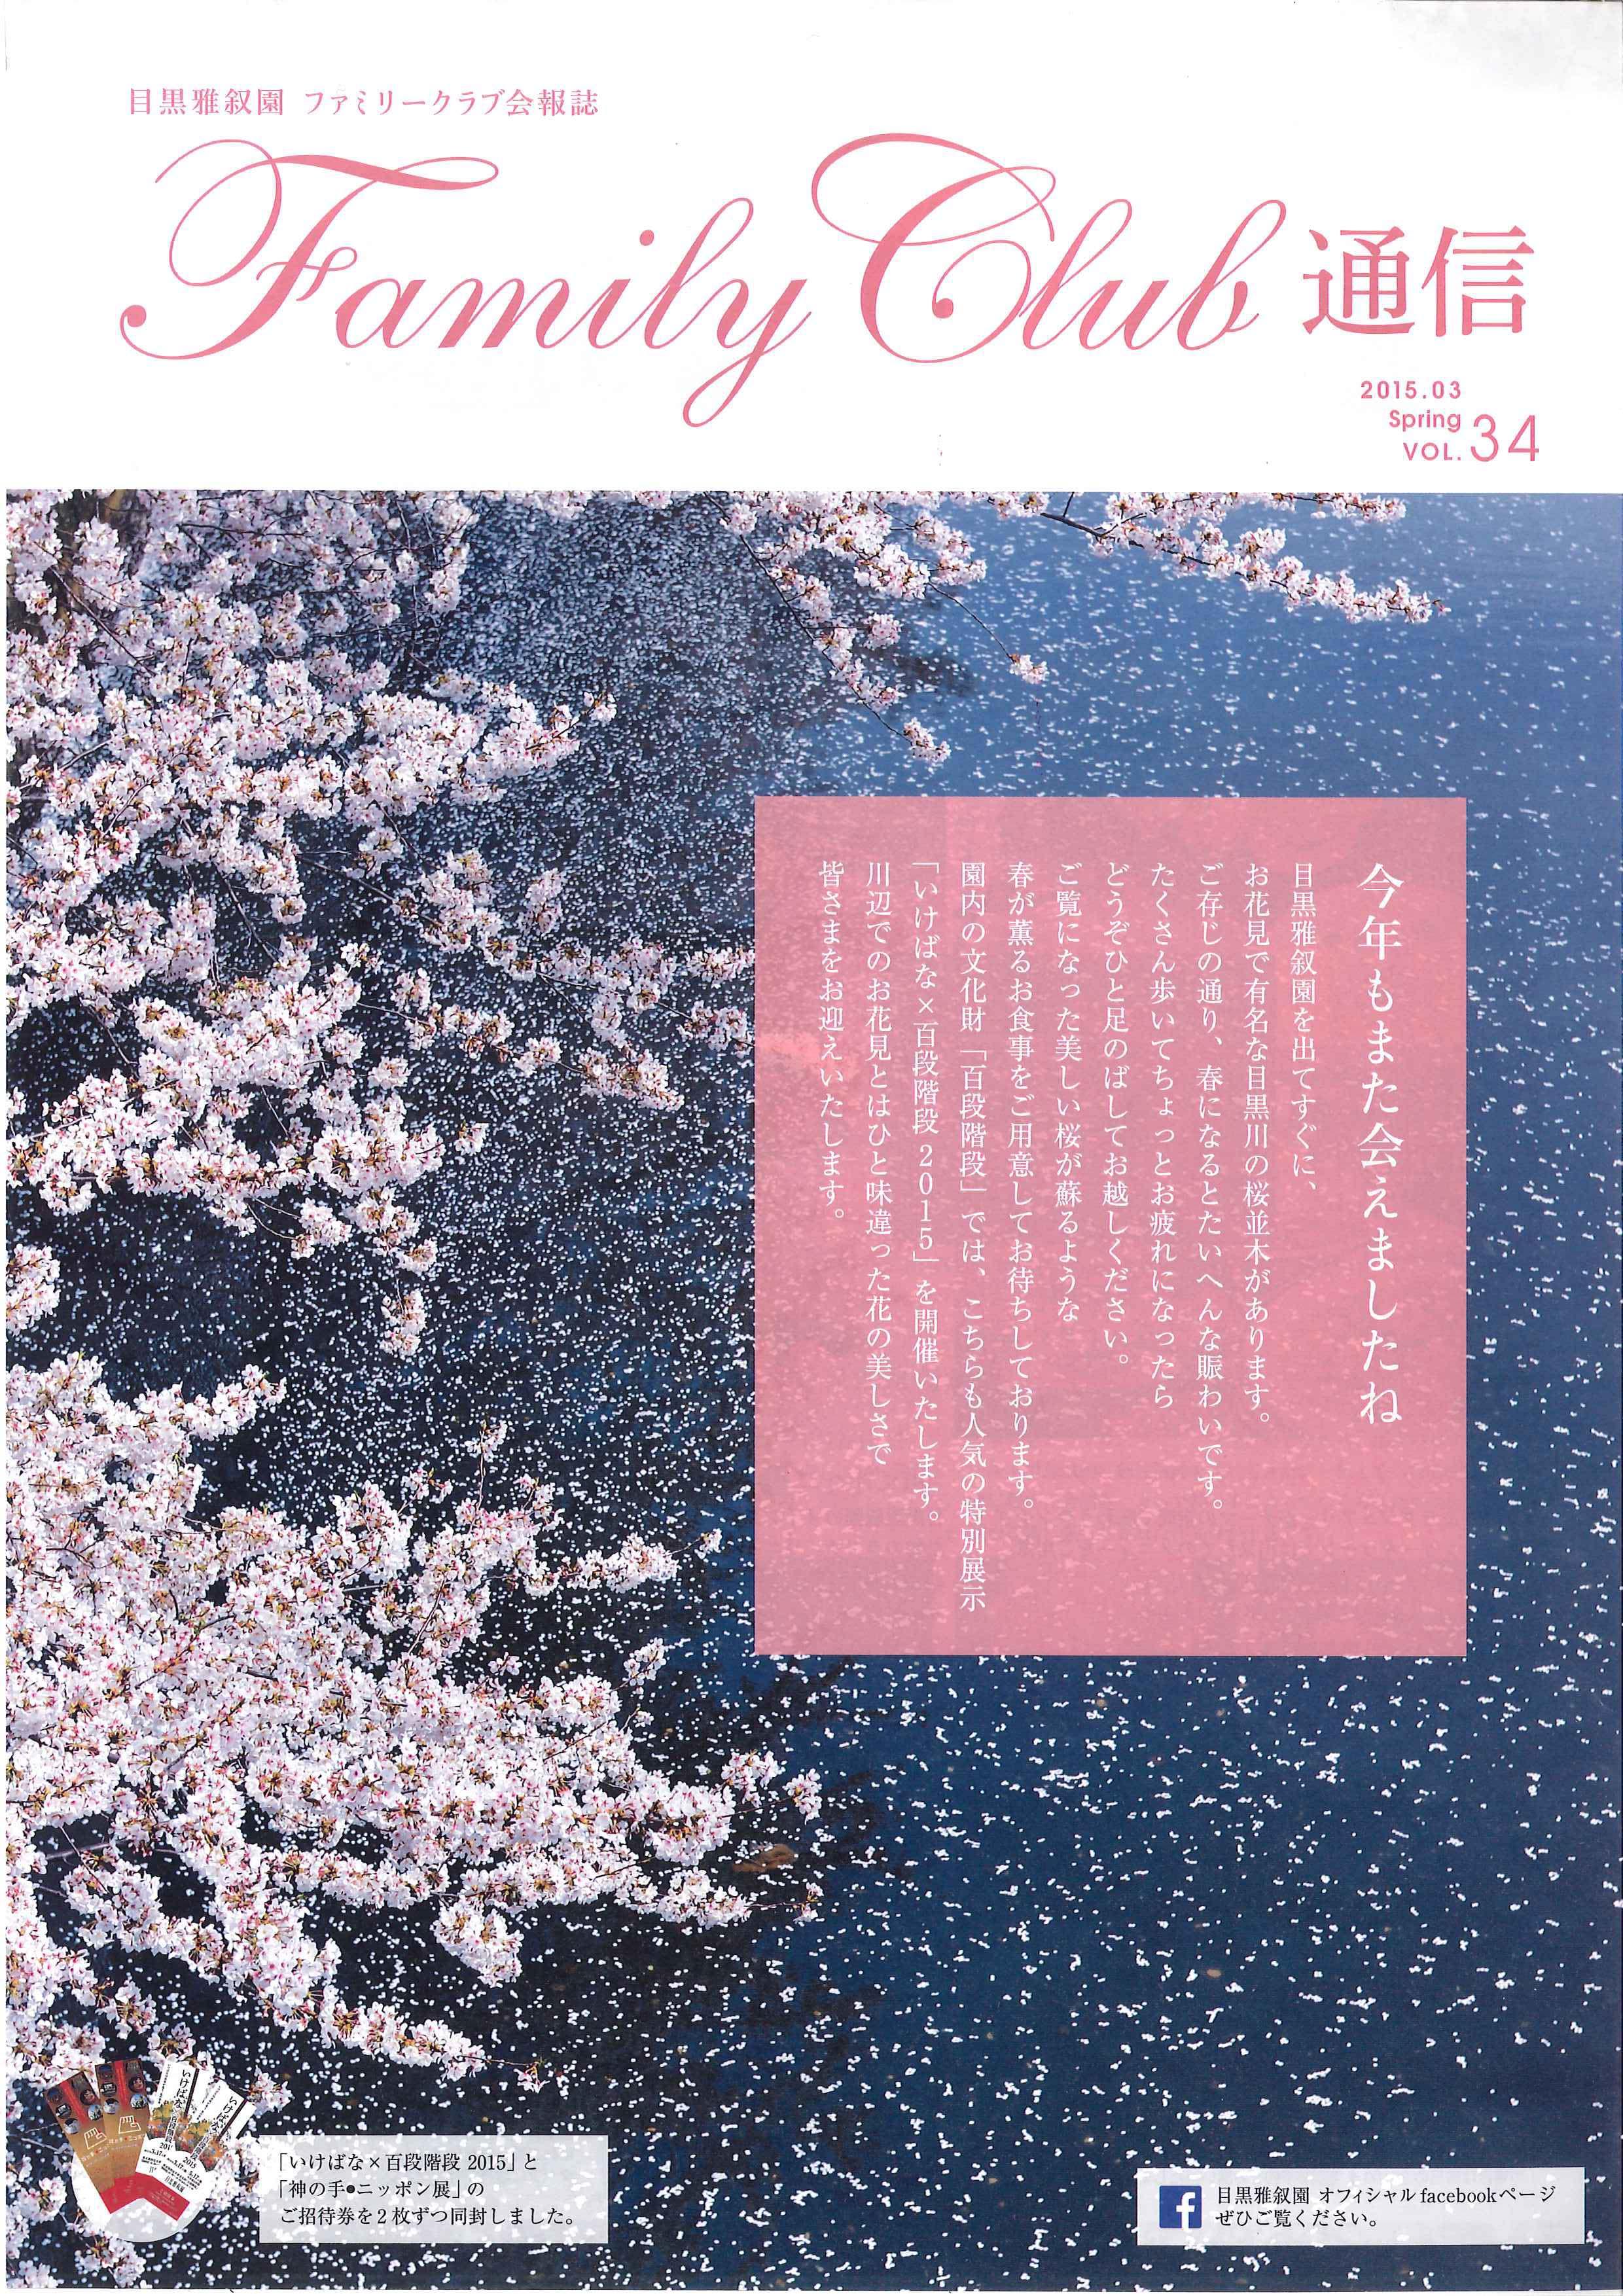 「Family Club 通信」2015.03 Spring VOL.34